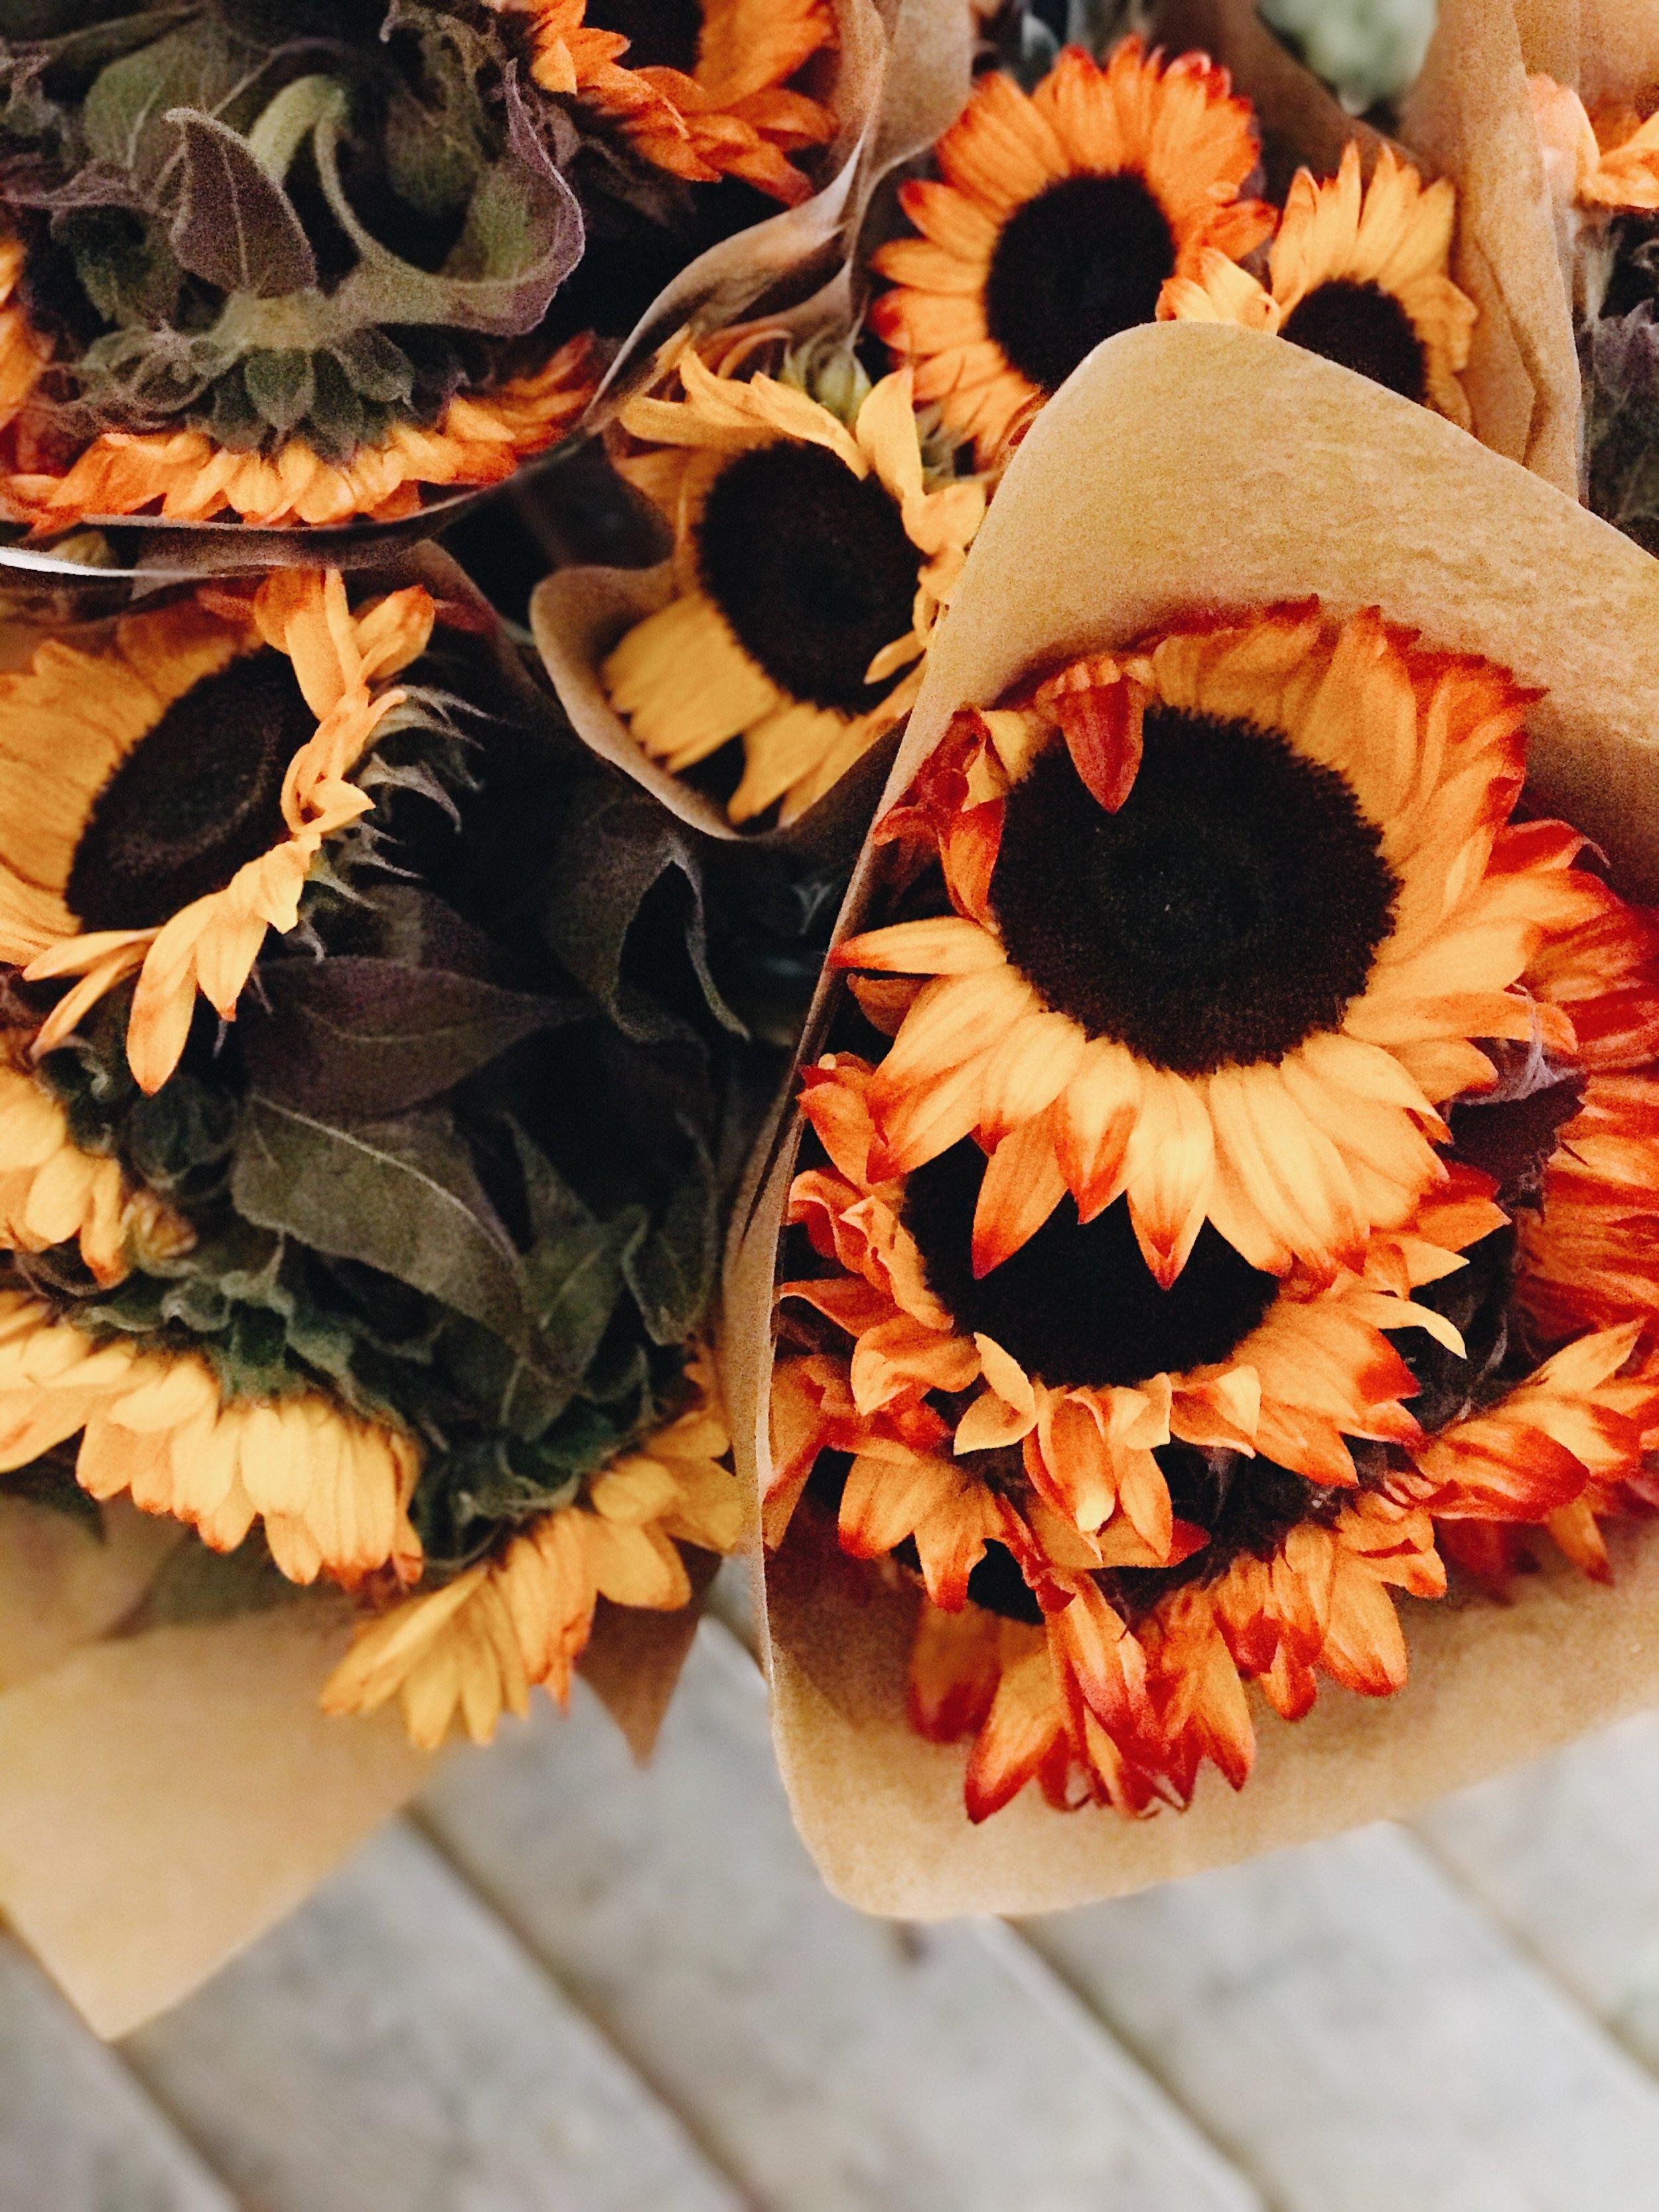 Fall Flowers 101, Orange Sunflowers, Nyla Free Designs Inc.